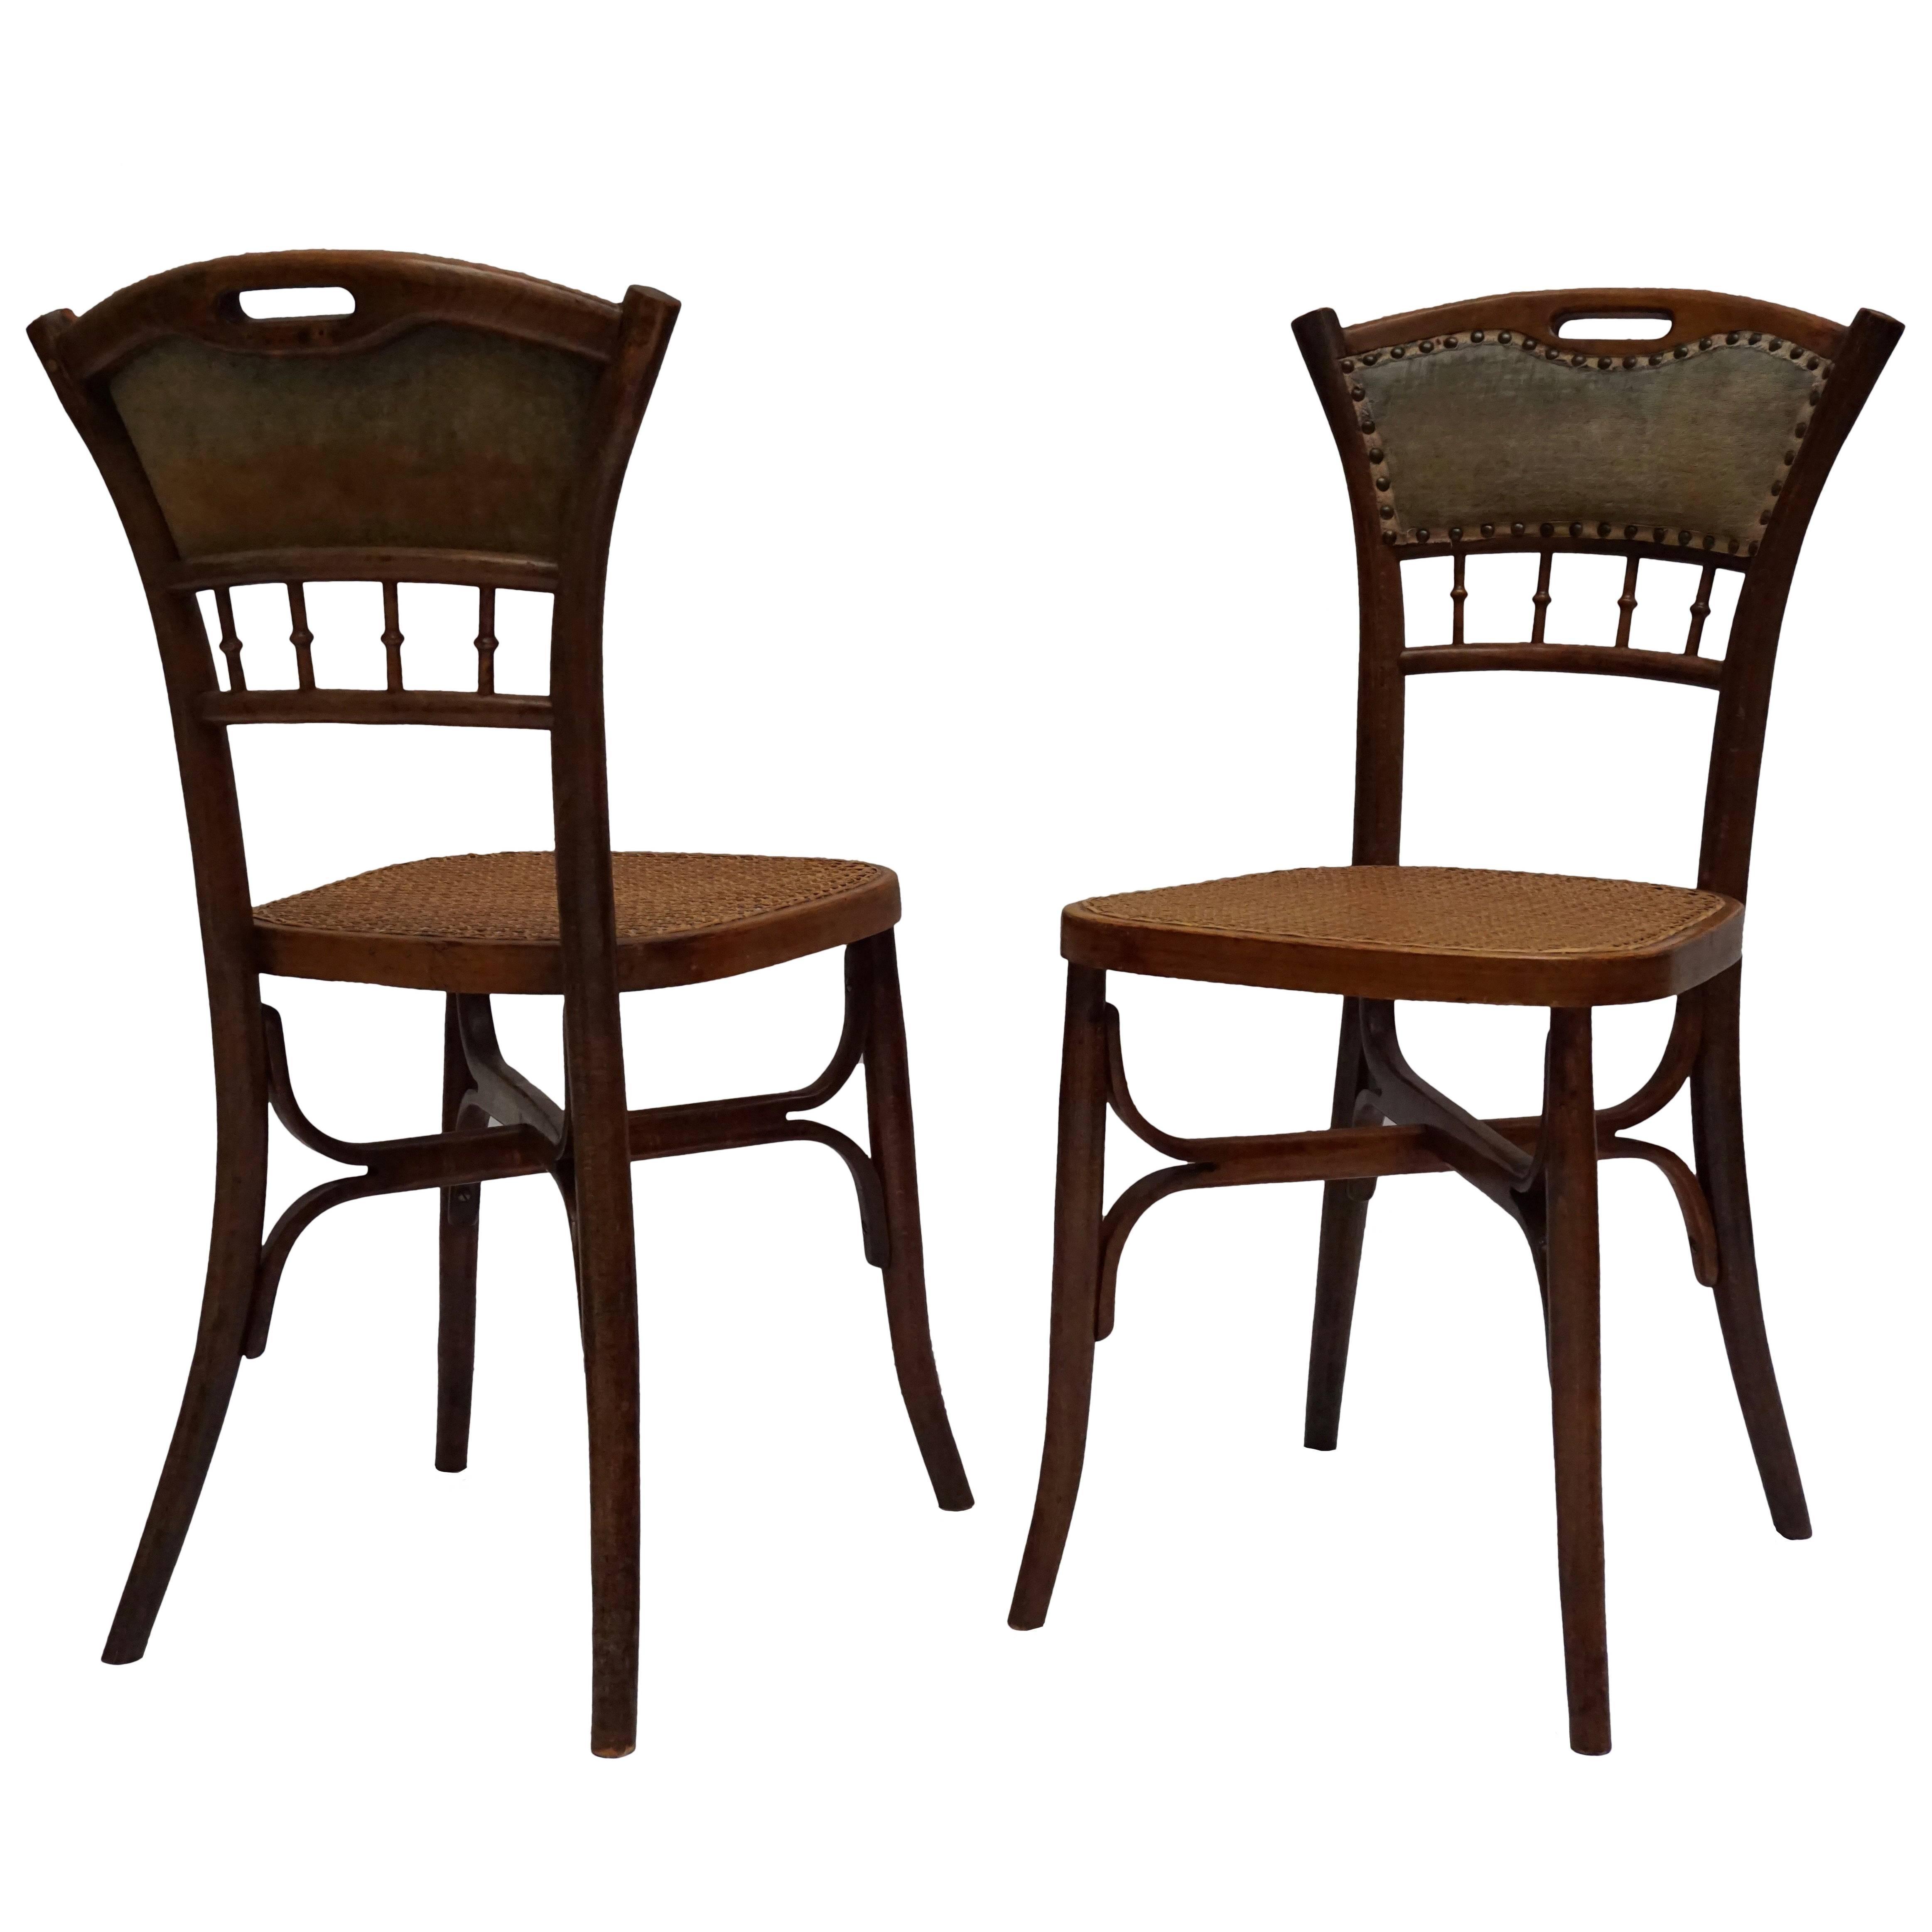 Great Set of 40 Art Nouveau Chairs, circa 1900